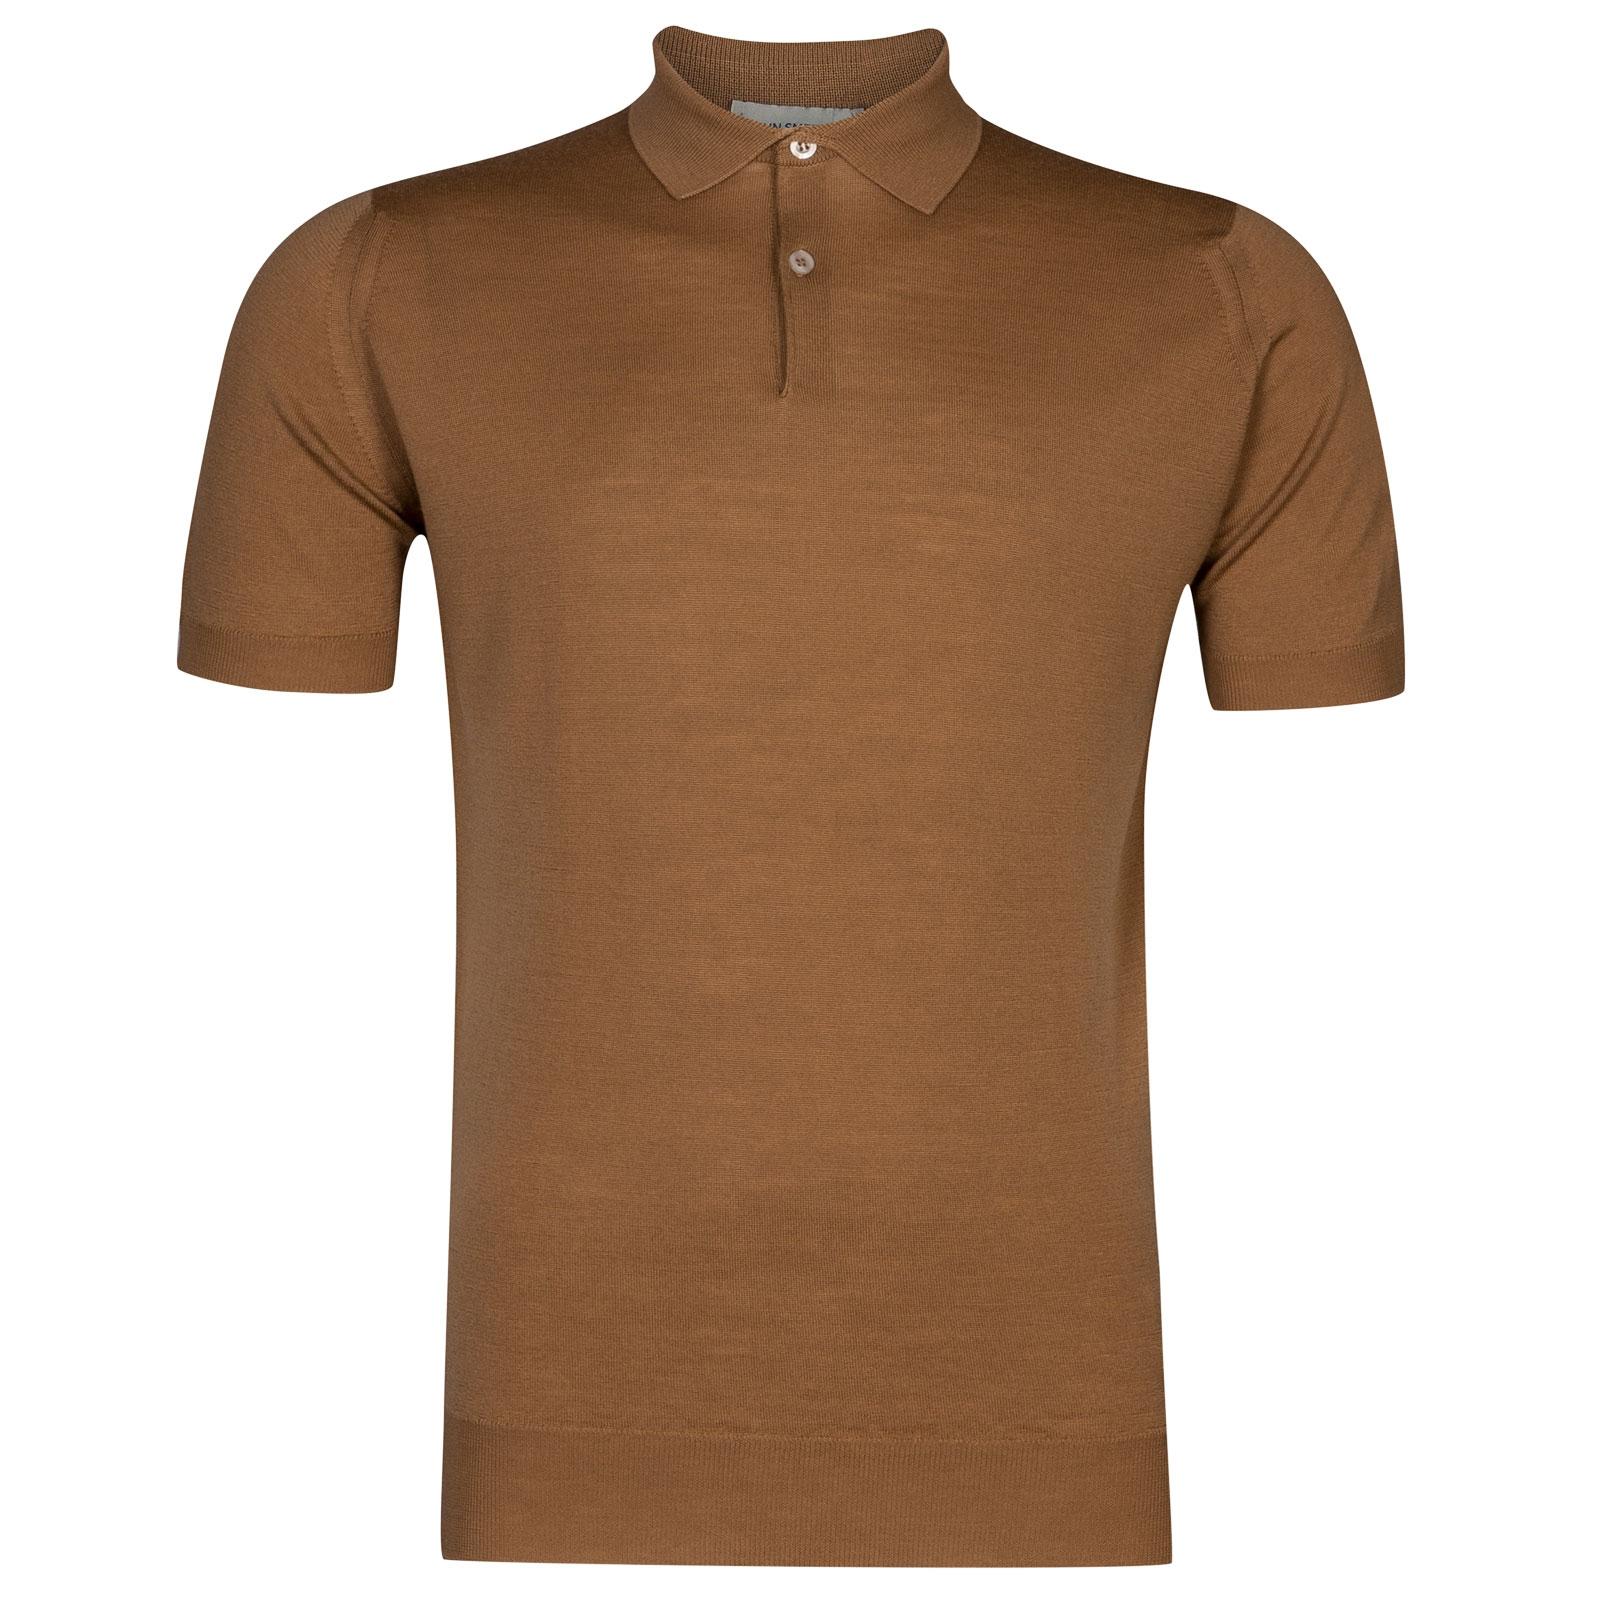 John Smedley Payton in Camel Shirt-SML